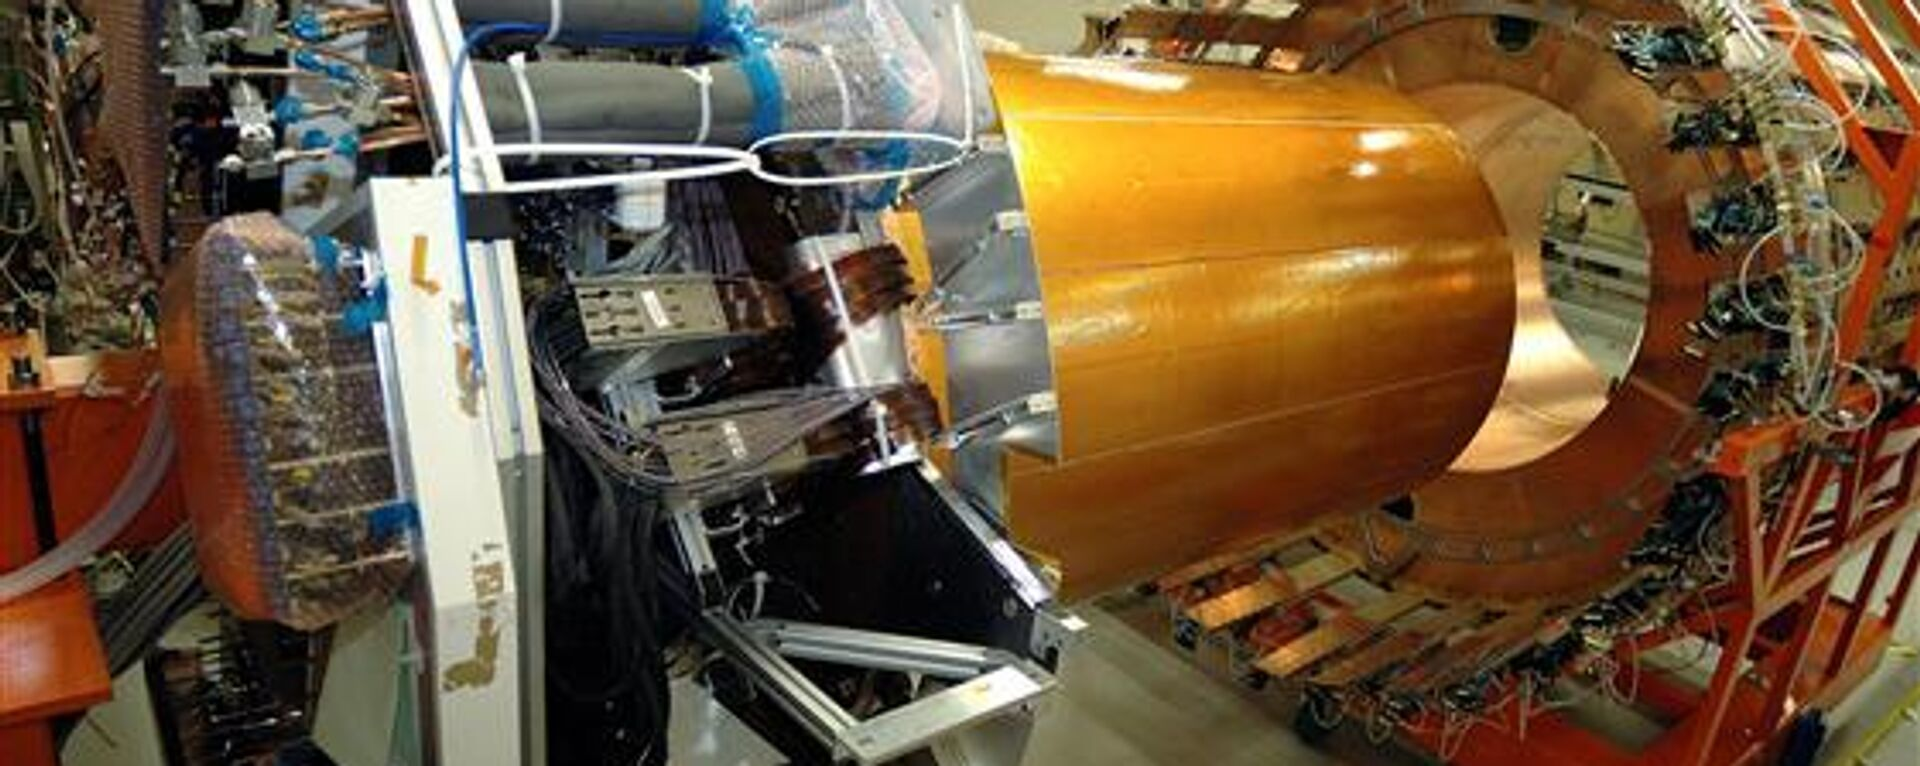 Acceleratore Large Hadron Collider - Sputnik Italia, 1920, 08.04.2021